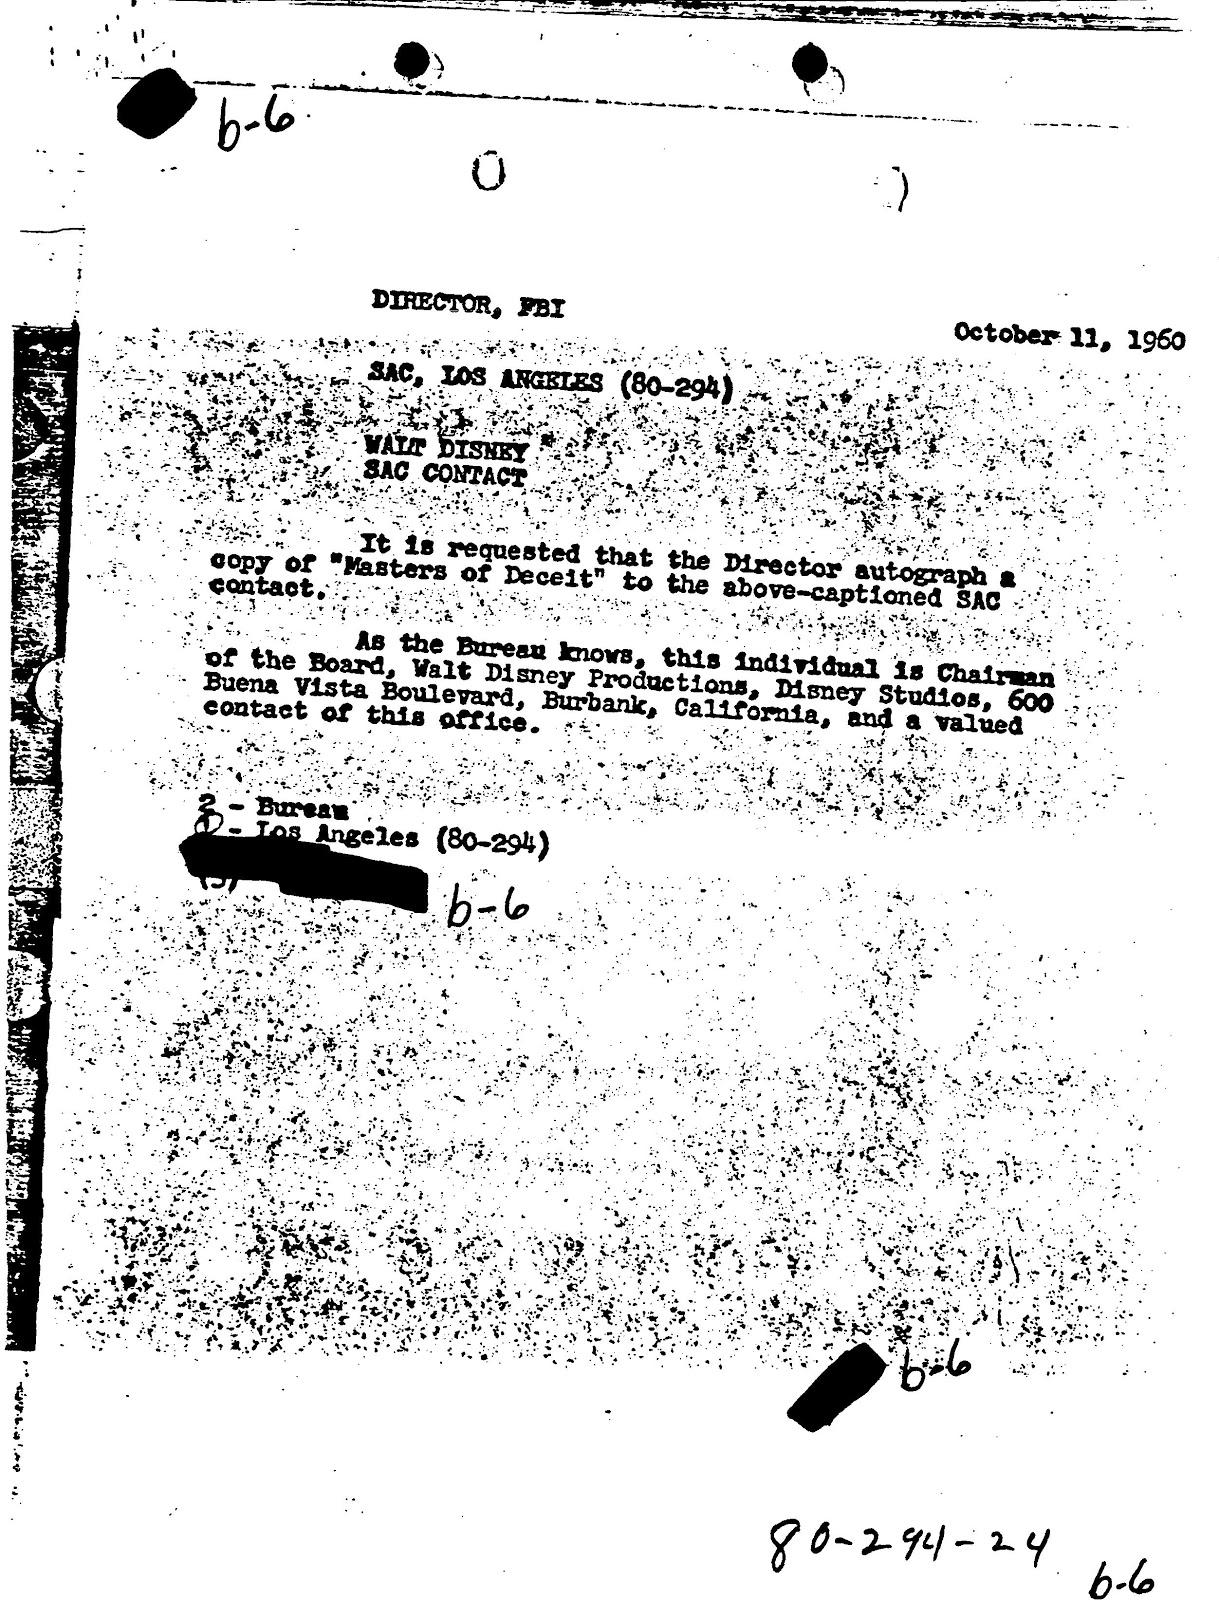 Walt Disney's FBI File: Part 2